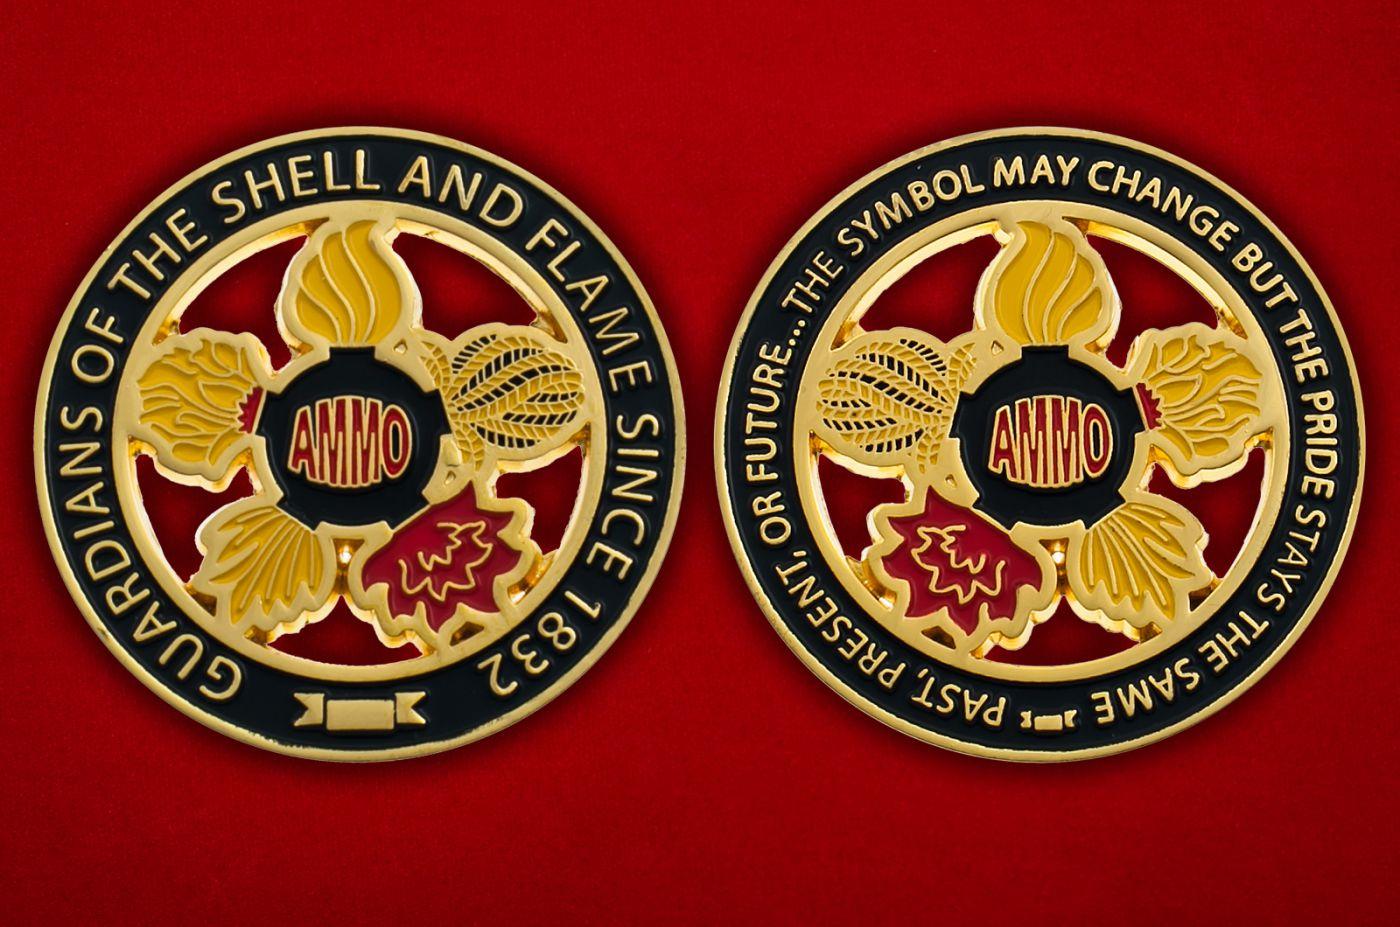 Челлендж коин Корпуса Артиллерийского вооружения Армии США - аверс и реверс